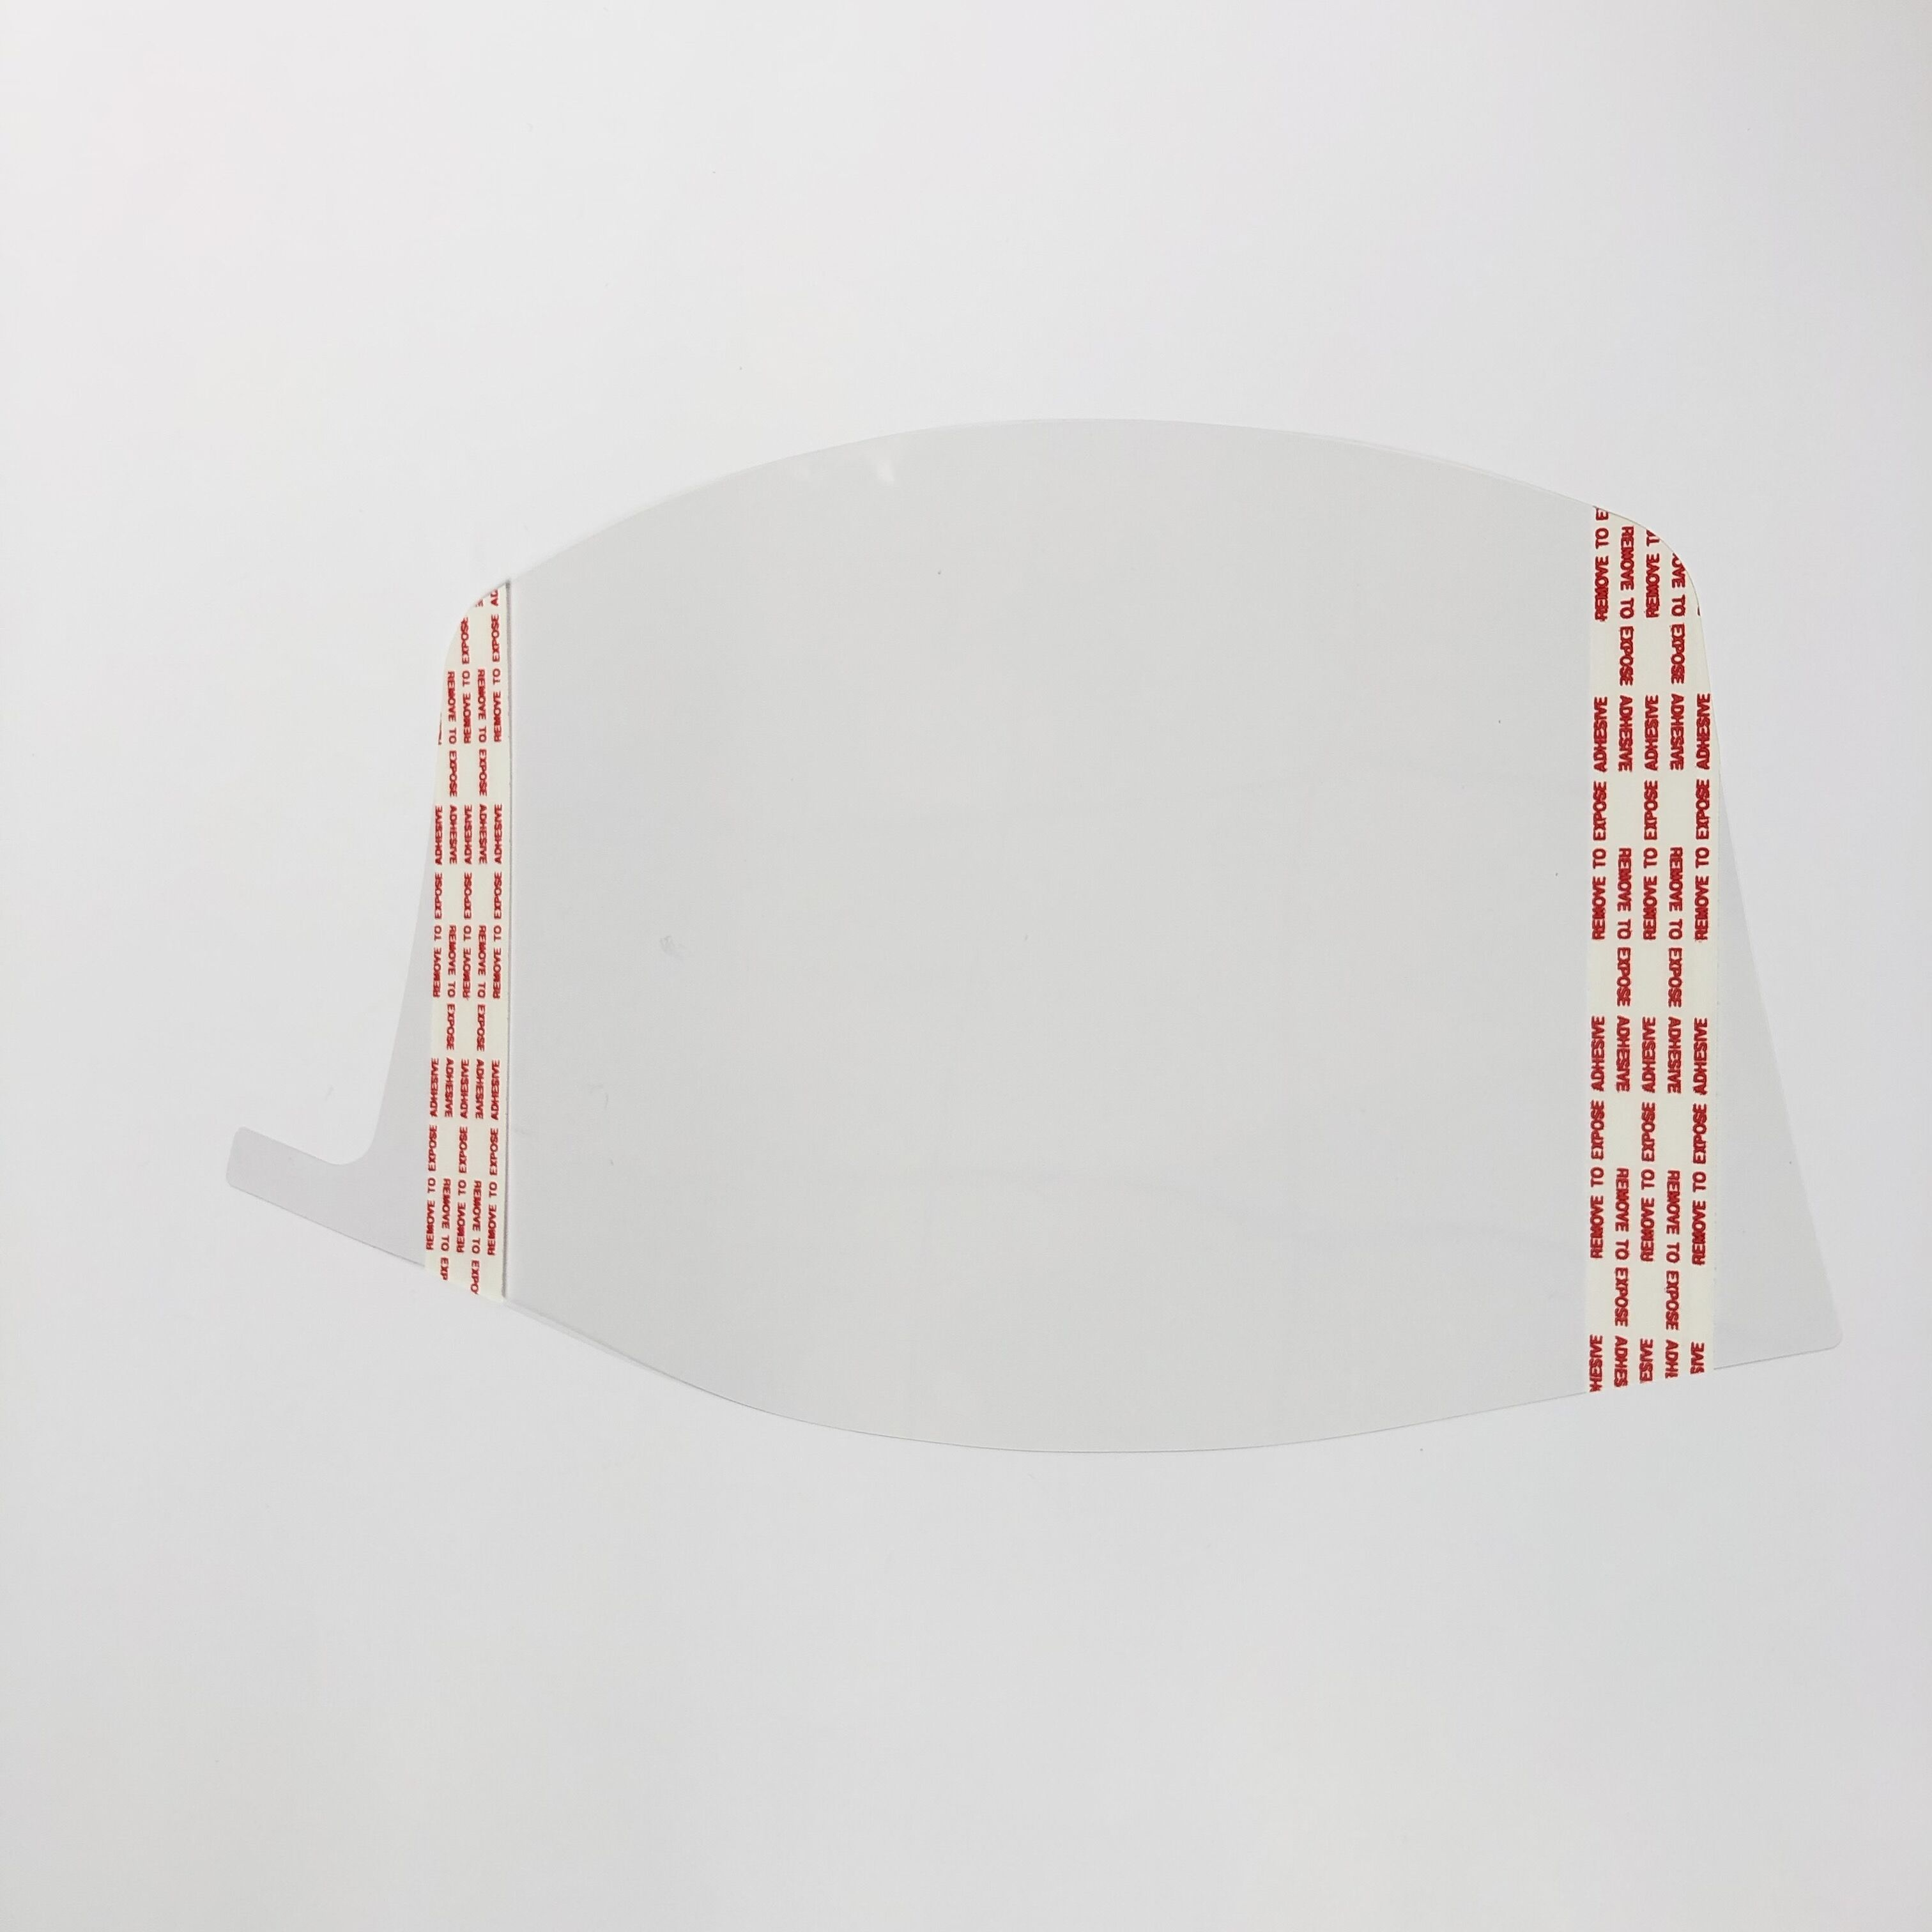 3M M-928视窗保护膜(M-927高级面镜上用的面镜保护膜 不留残胶)